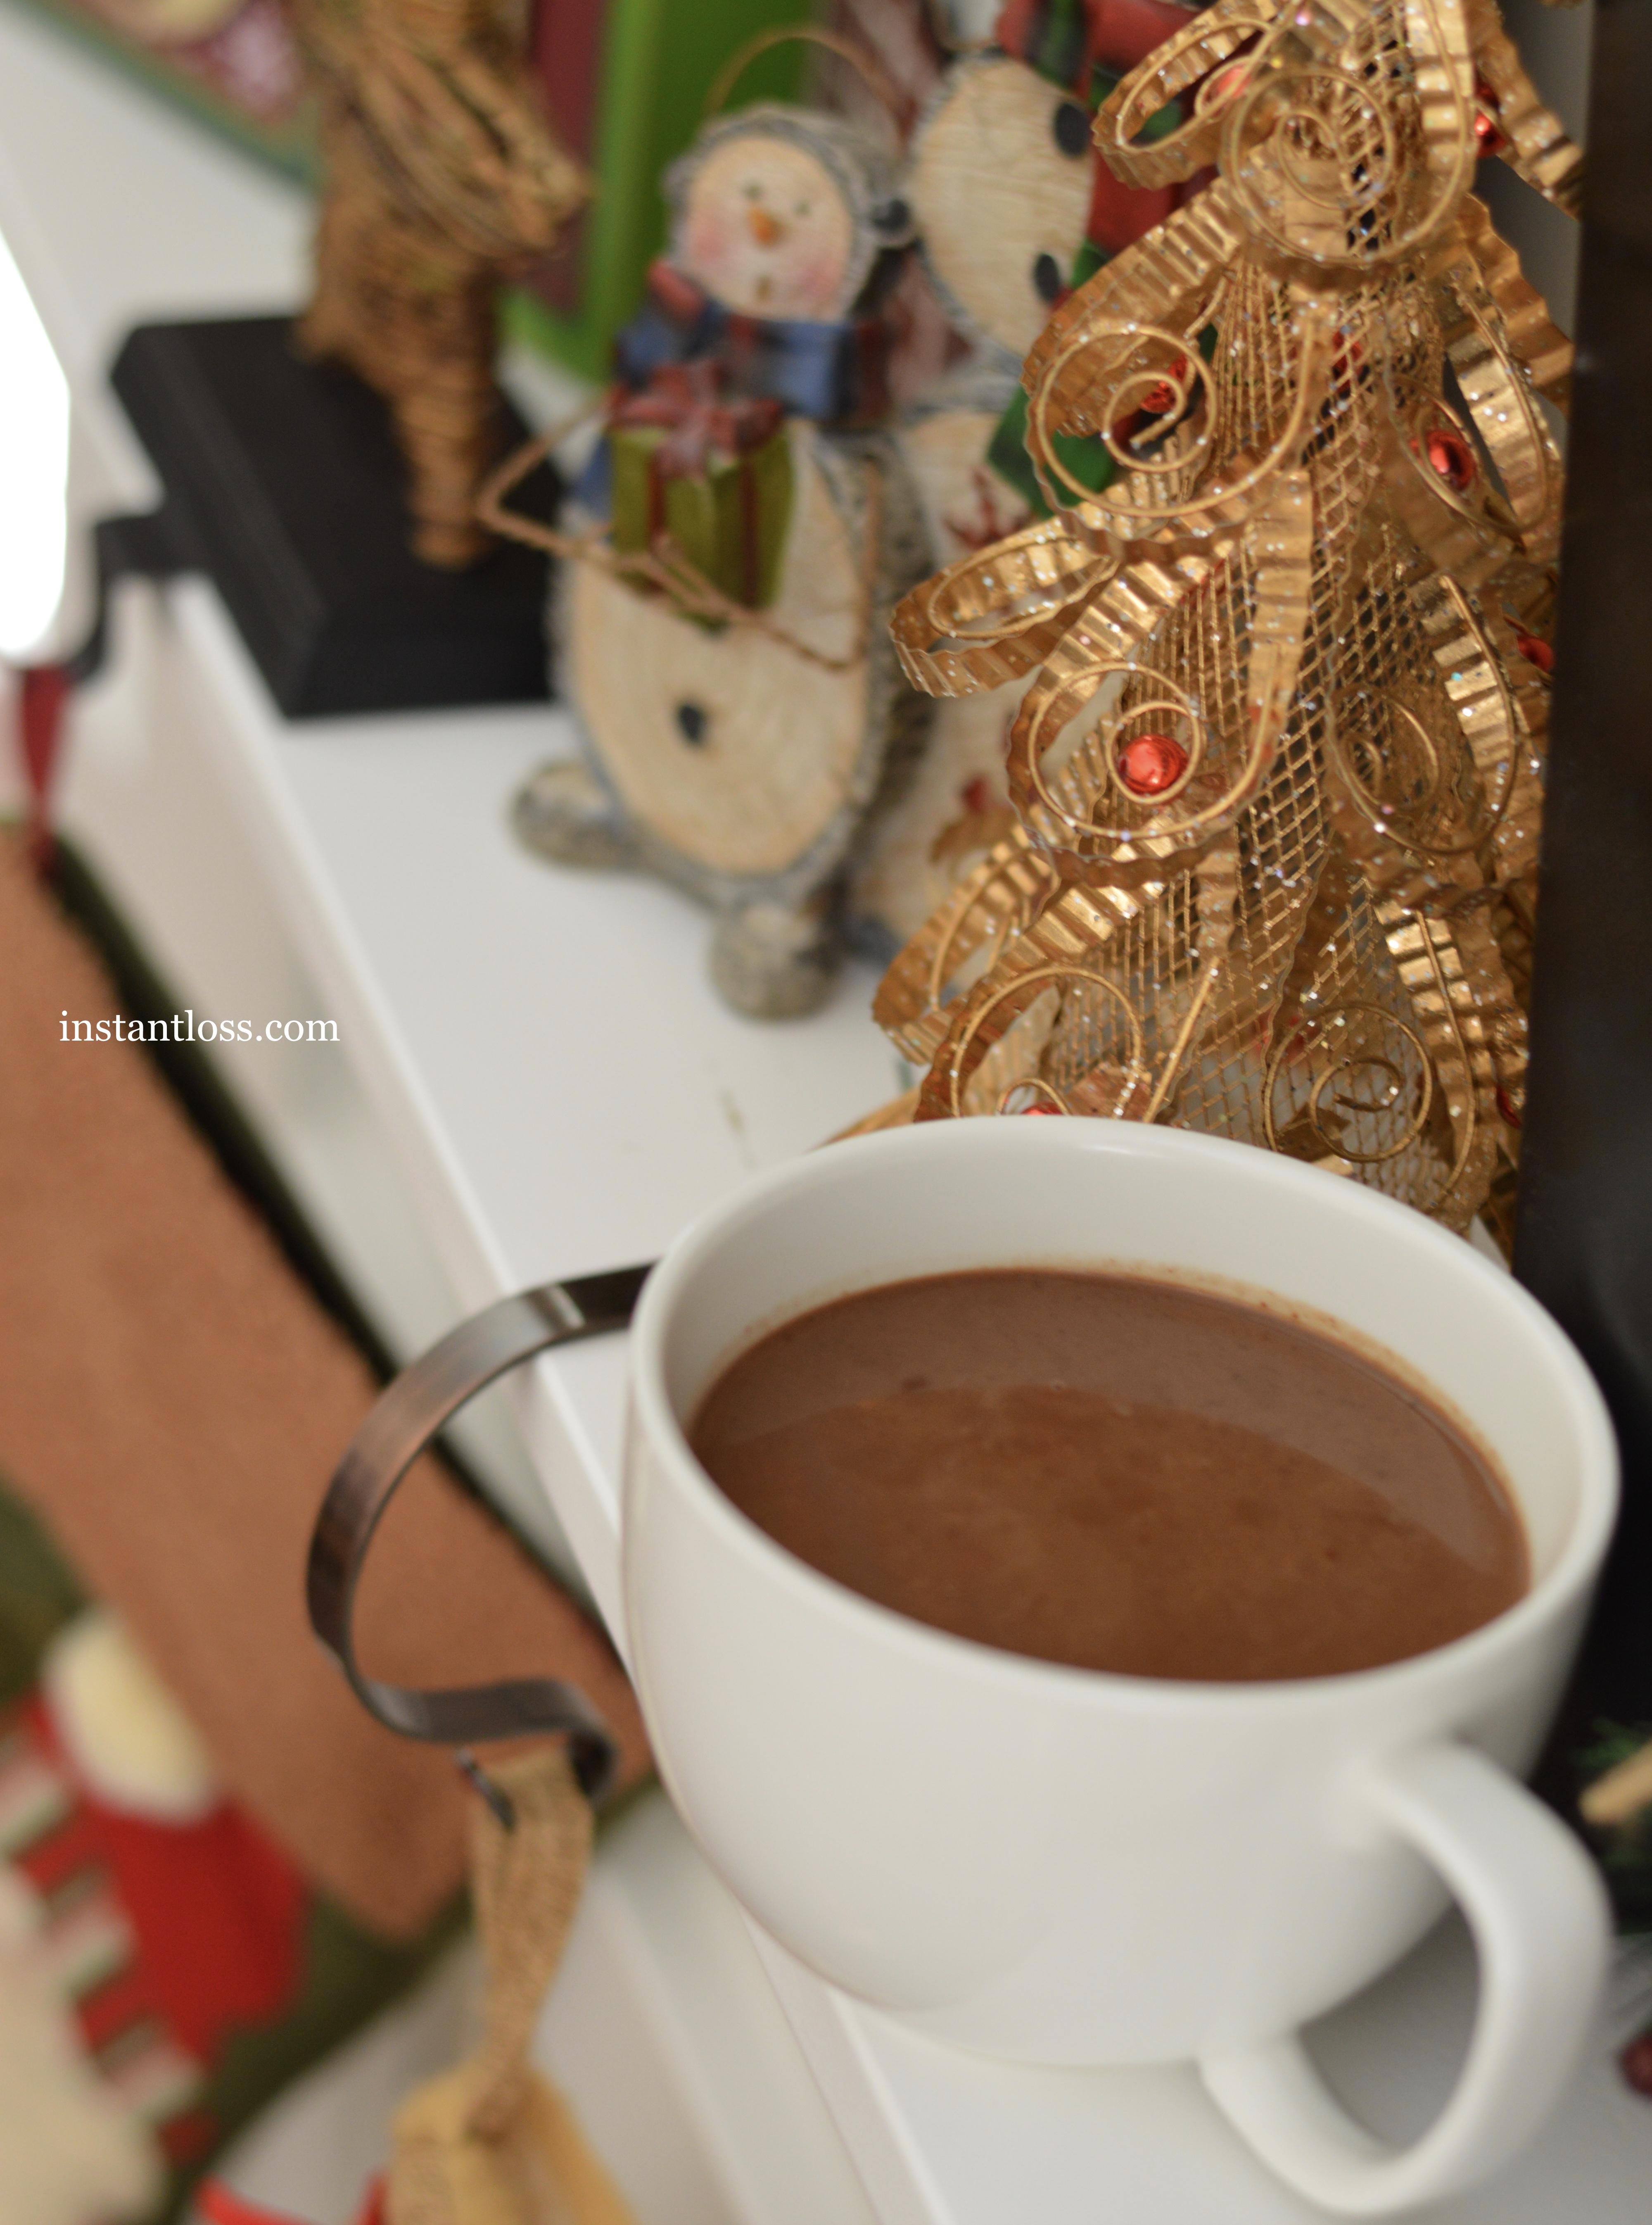 Dairy Free Instant Pot Hot Chocolate instantloss.com